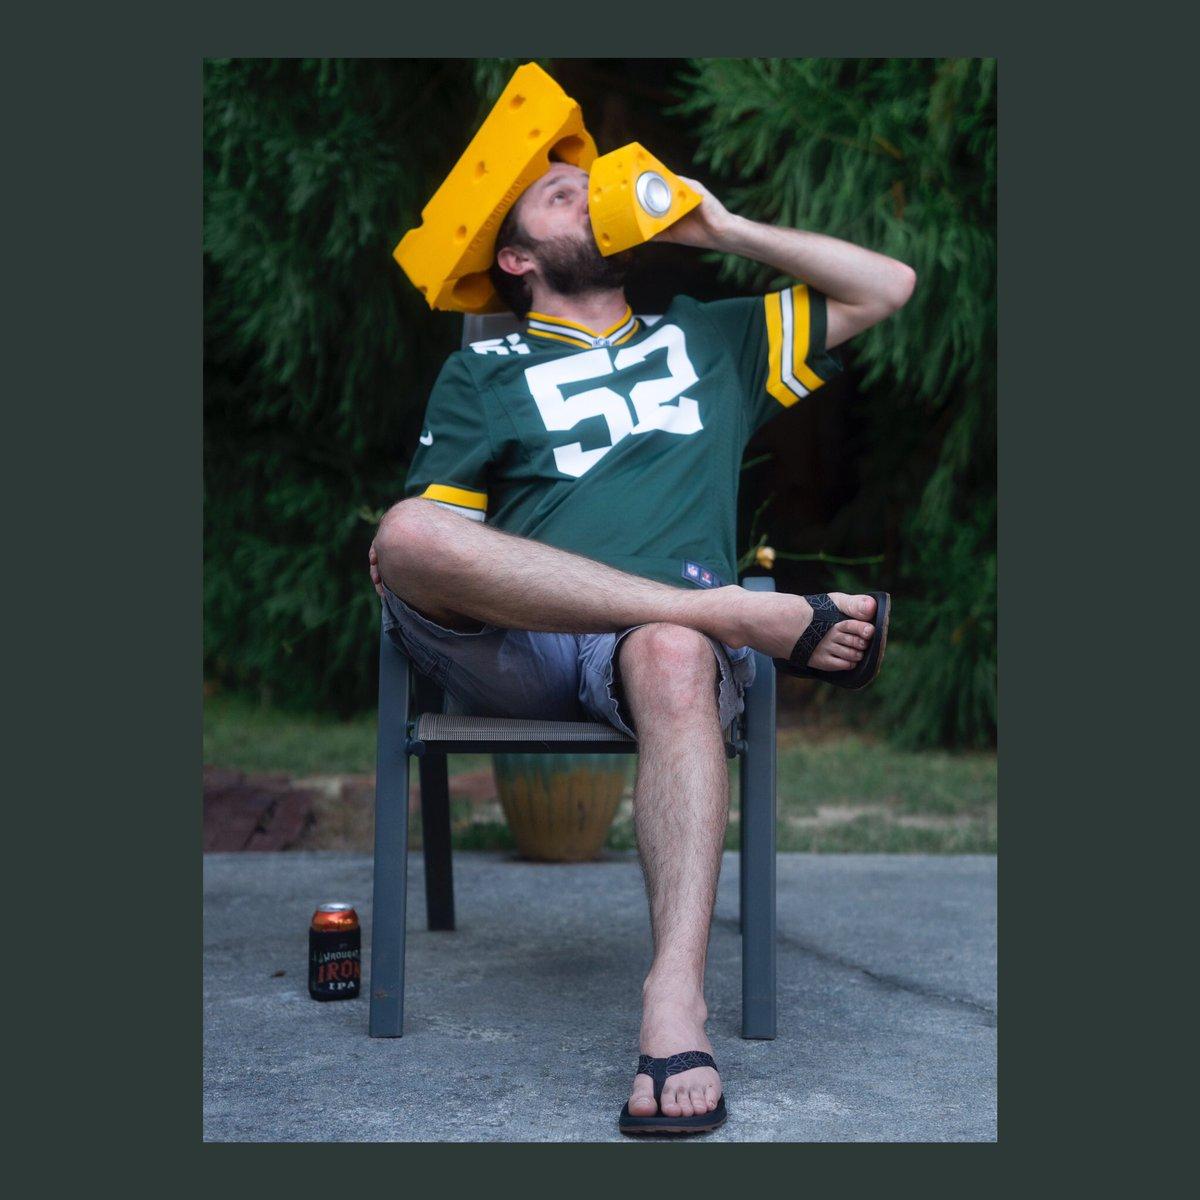 Portrait 9 Evan Age 31 Maybe a little cheesy 🧀 #photography #portraitoftheday #portraitphotography #portraits #cheesehead #greenbay #sports #acworth #georgia #chattanoogaphotographer #sony #sonyalpha #a6400 #sigma #sigma56mmf14 https://t.co/LsACbZFZKQ